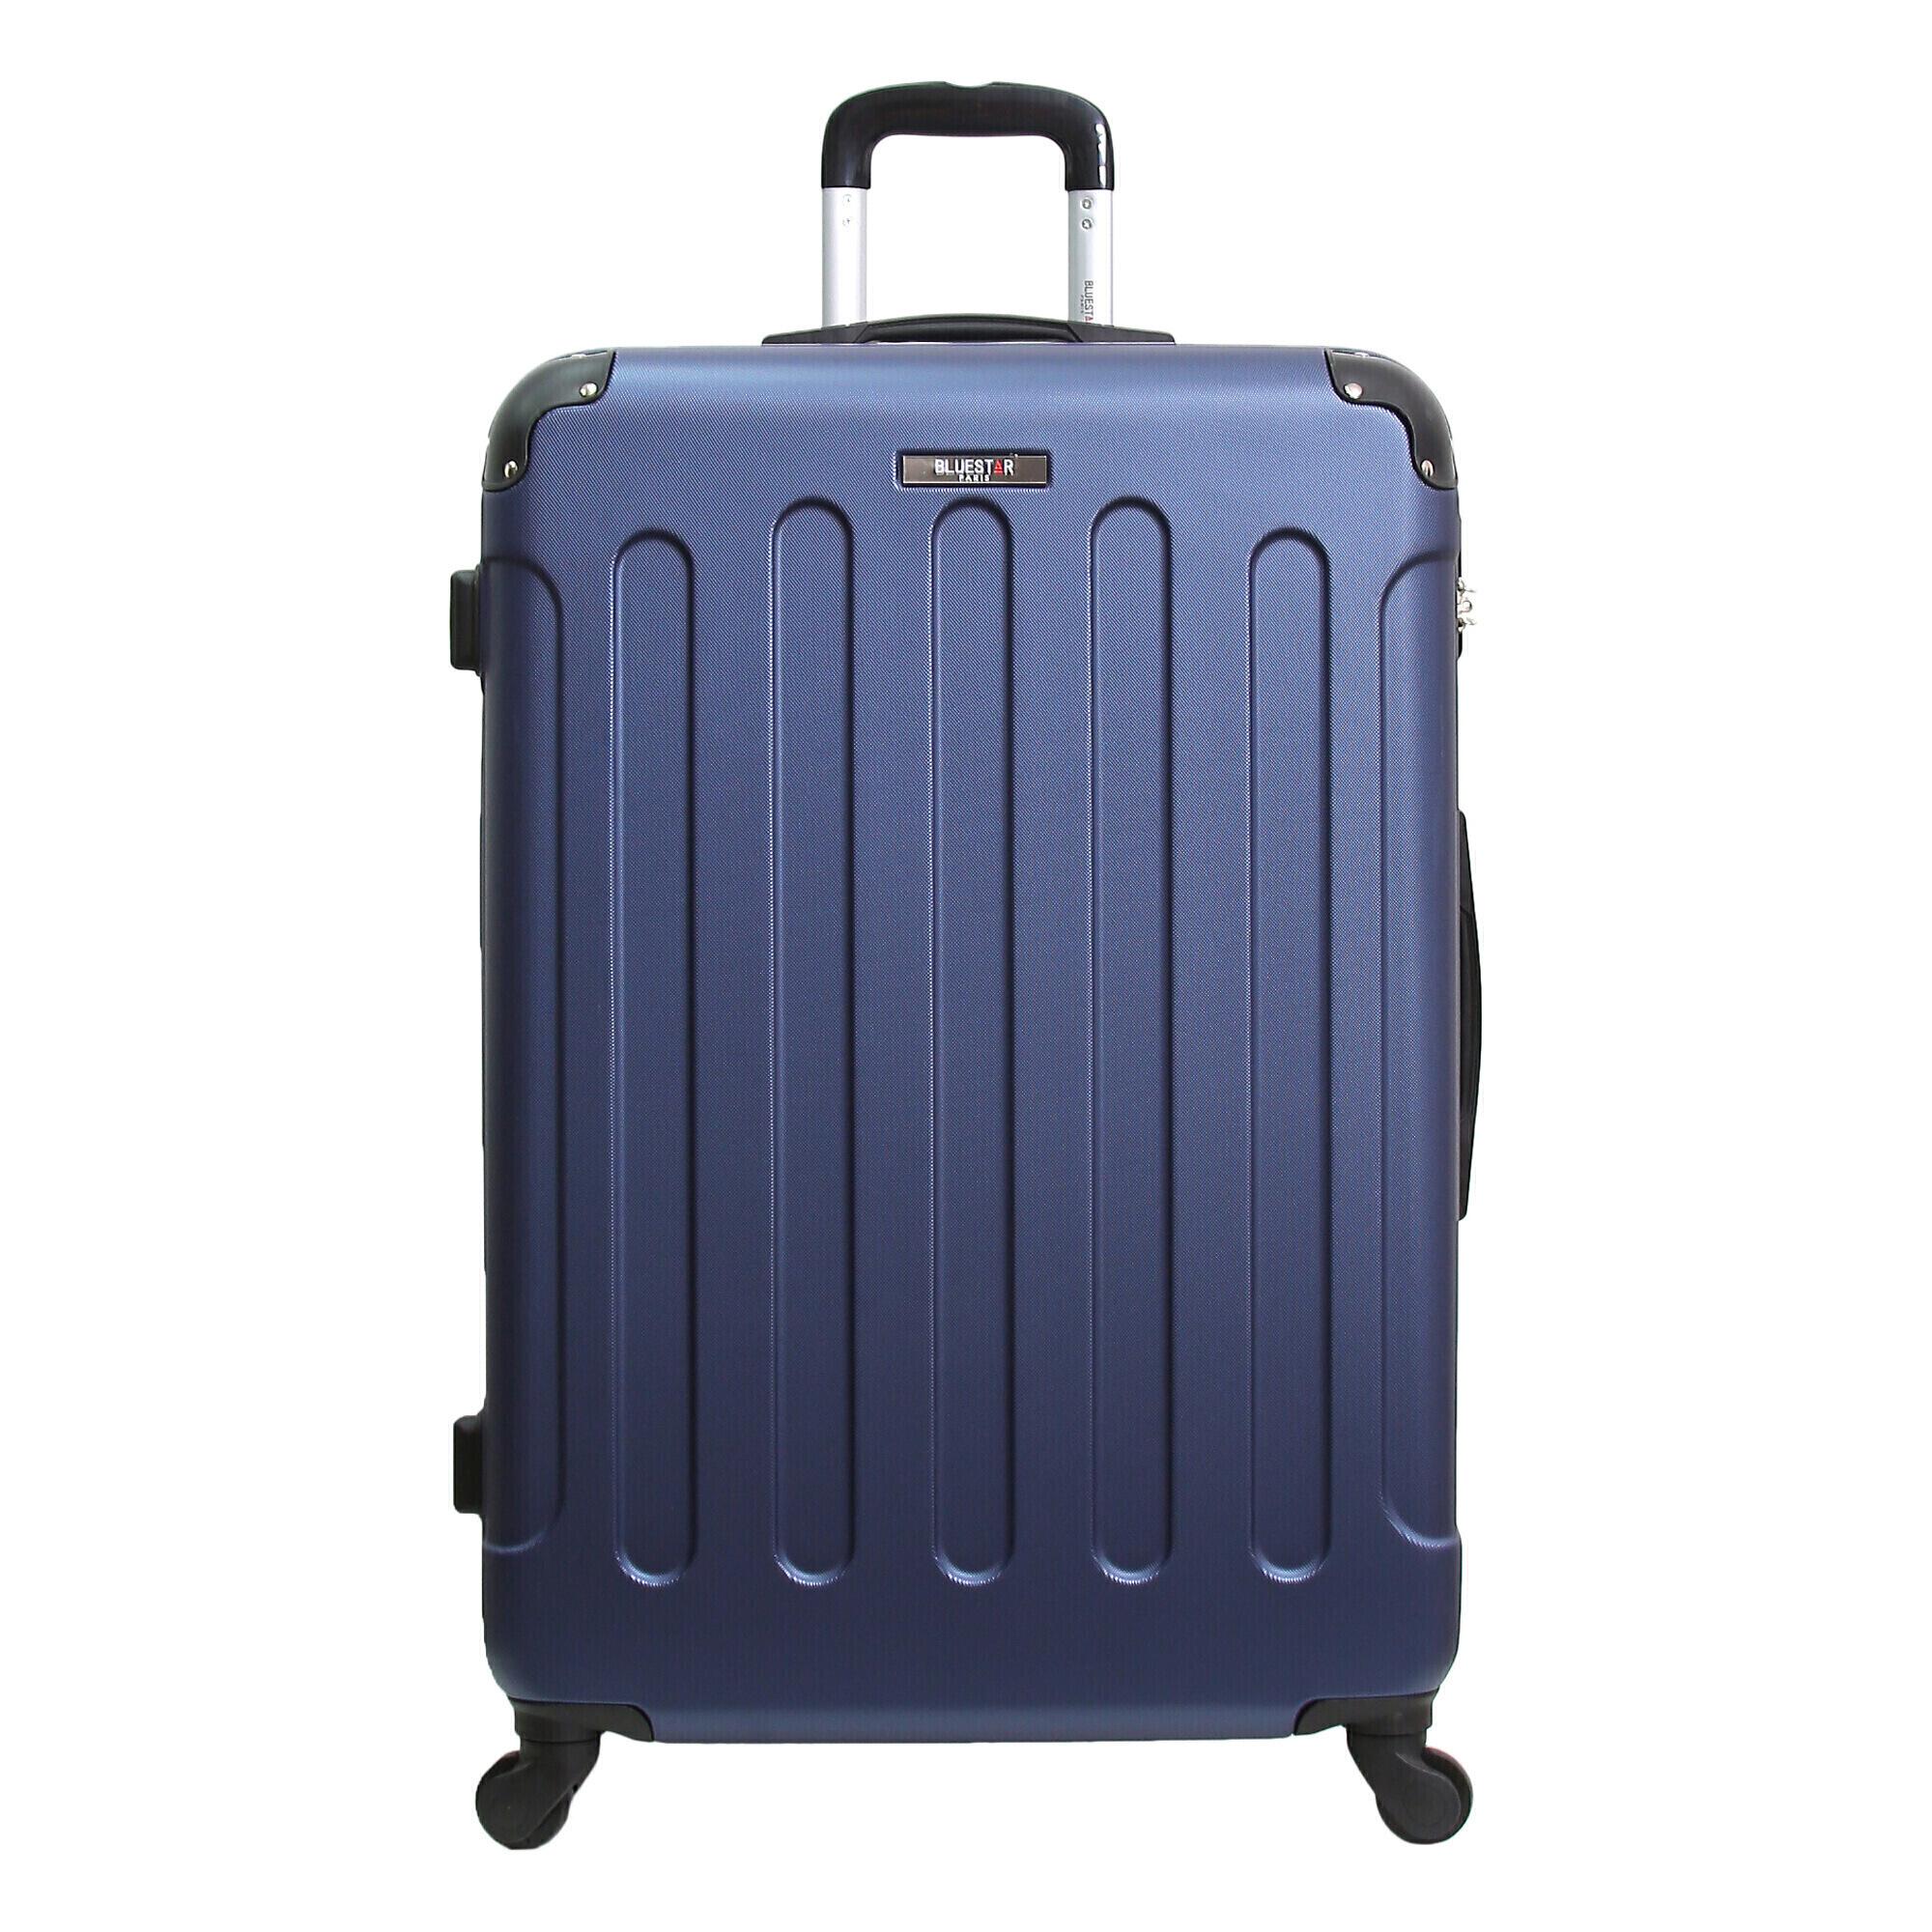 Valise Cabine Blue Star Madrid - 49 cm, 31 L